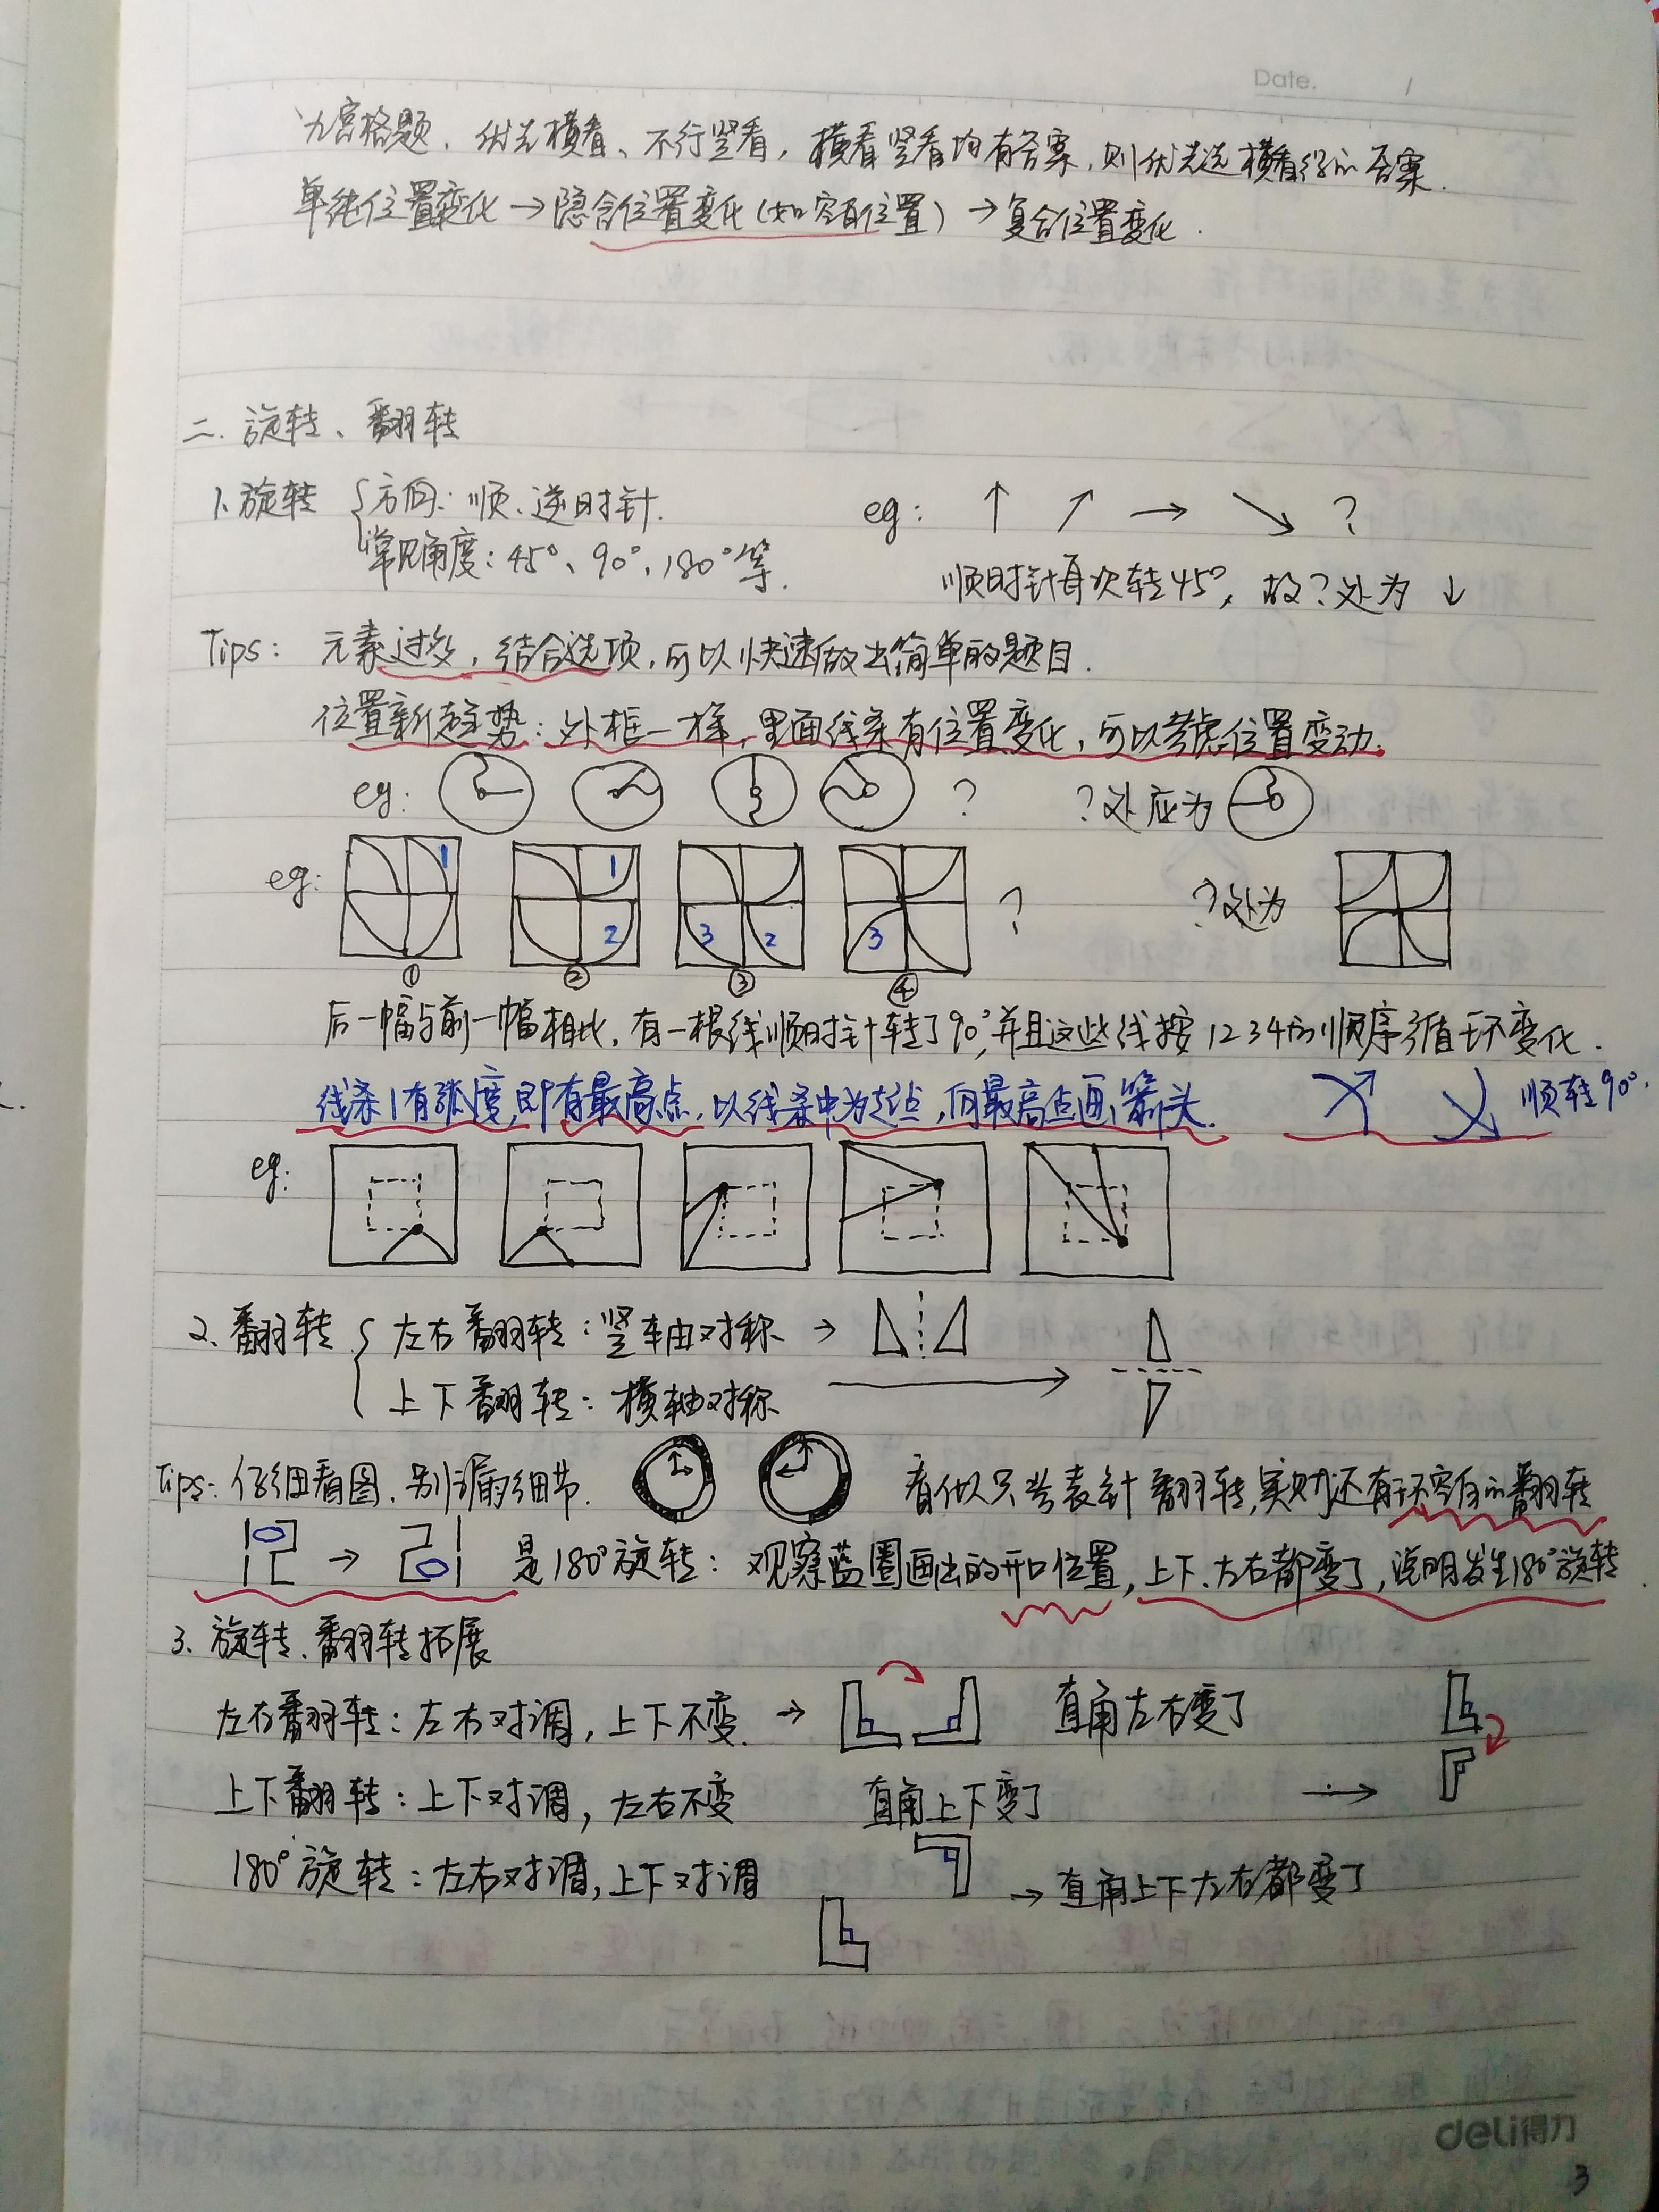 tmp_c4848cbf6736df12b1c999fed6e211fa2e6642b8849a6c5c.jpg